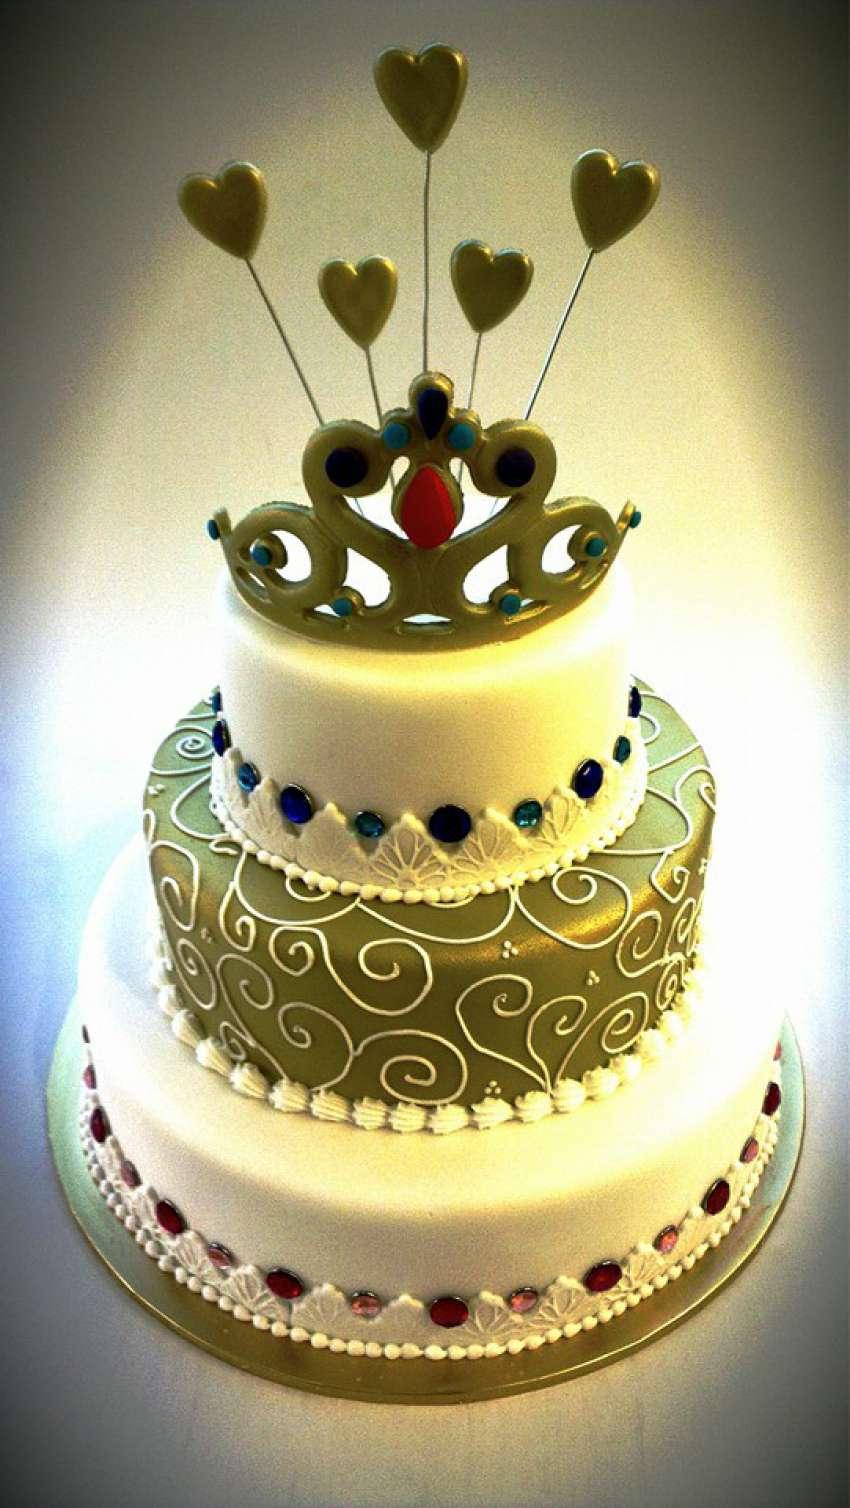 Wedding cakes in Penang, Malaysia | Hitchbird